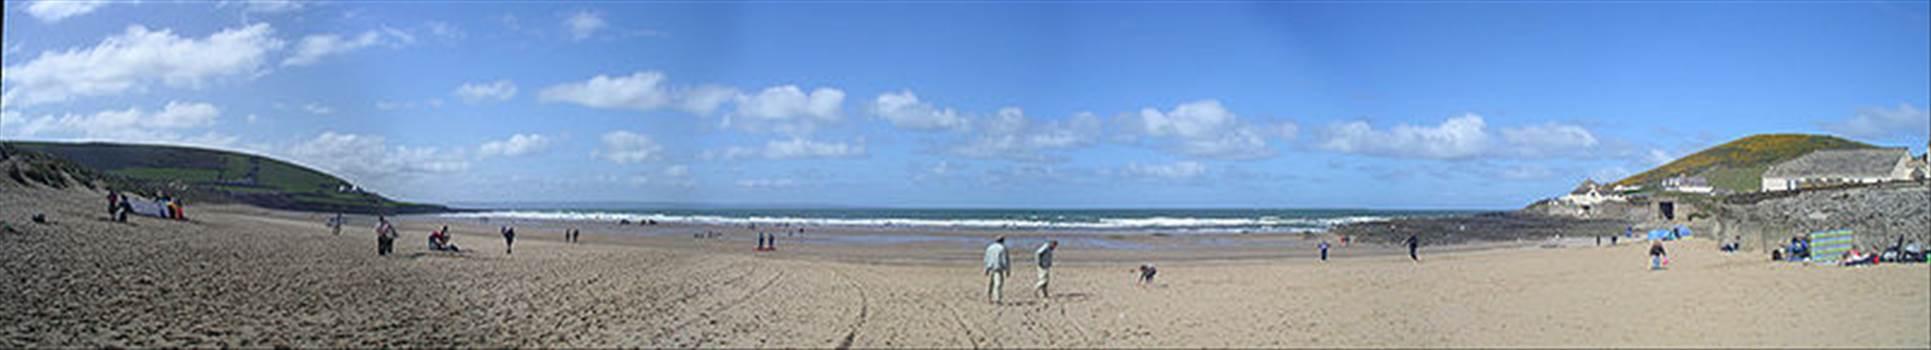 Croyde_beach_zps6e50e156.jpg -